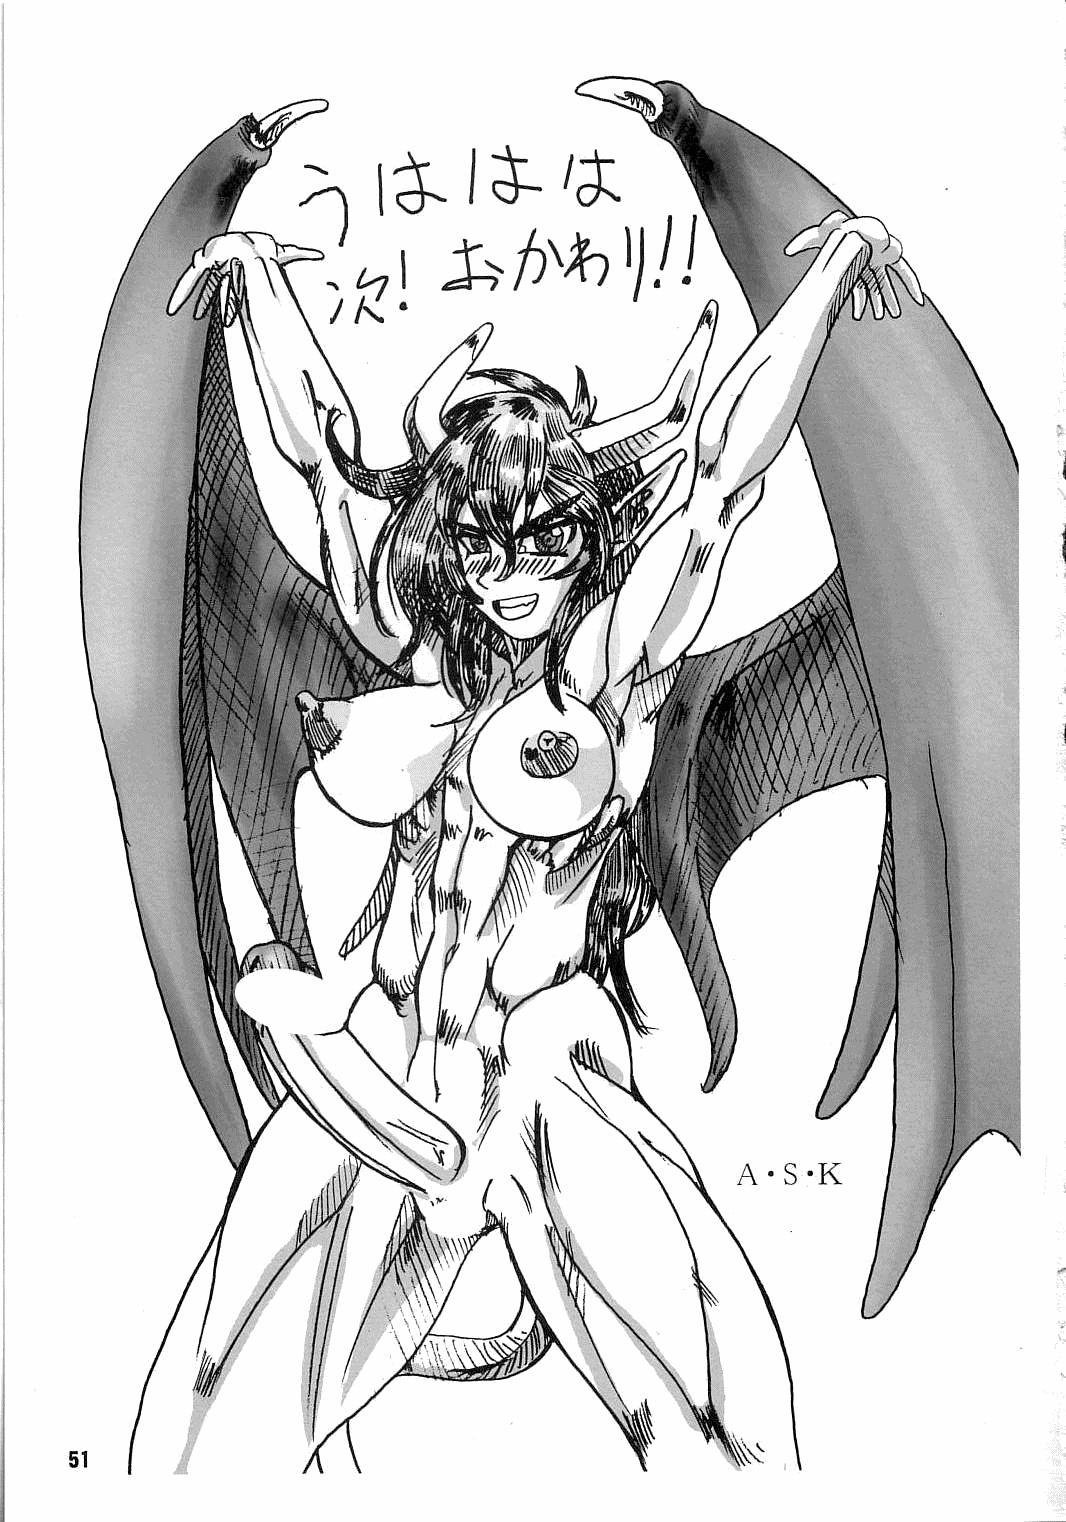 The Great Work of Alchemy Vol.15 - Meikyuu Oujo Prina 2 | Prina the Dungeoneering Princess 2 50